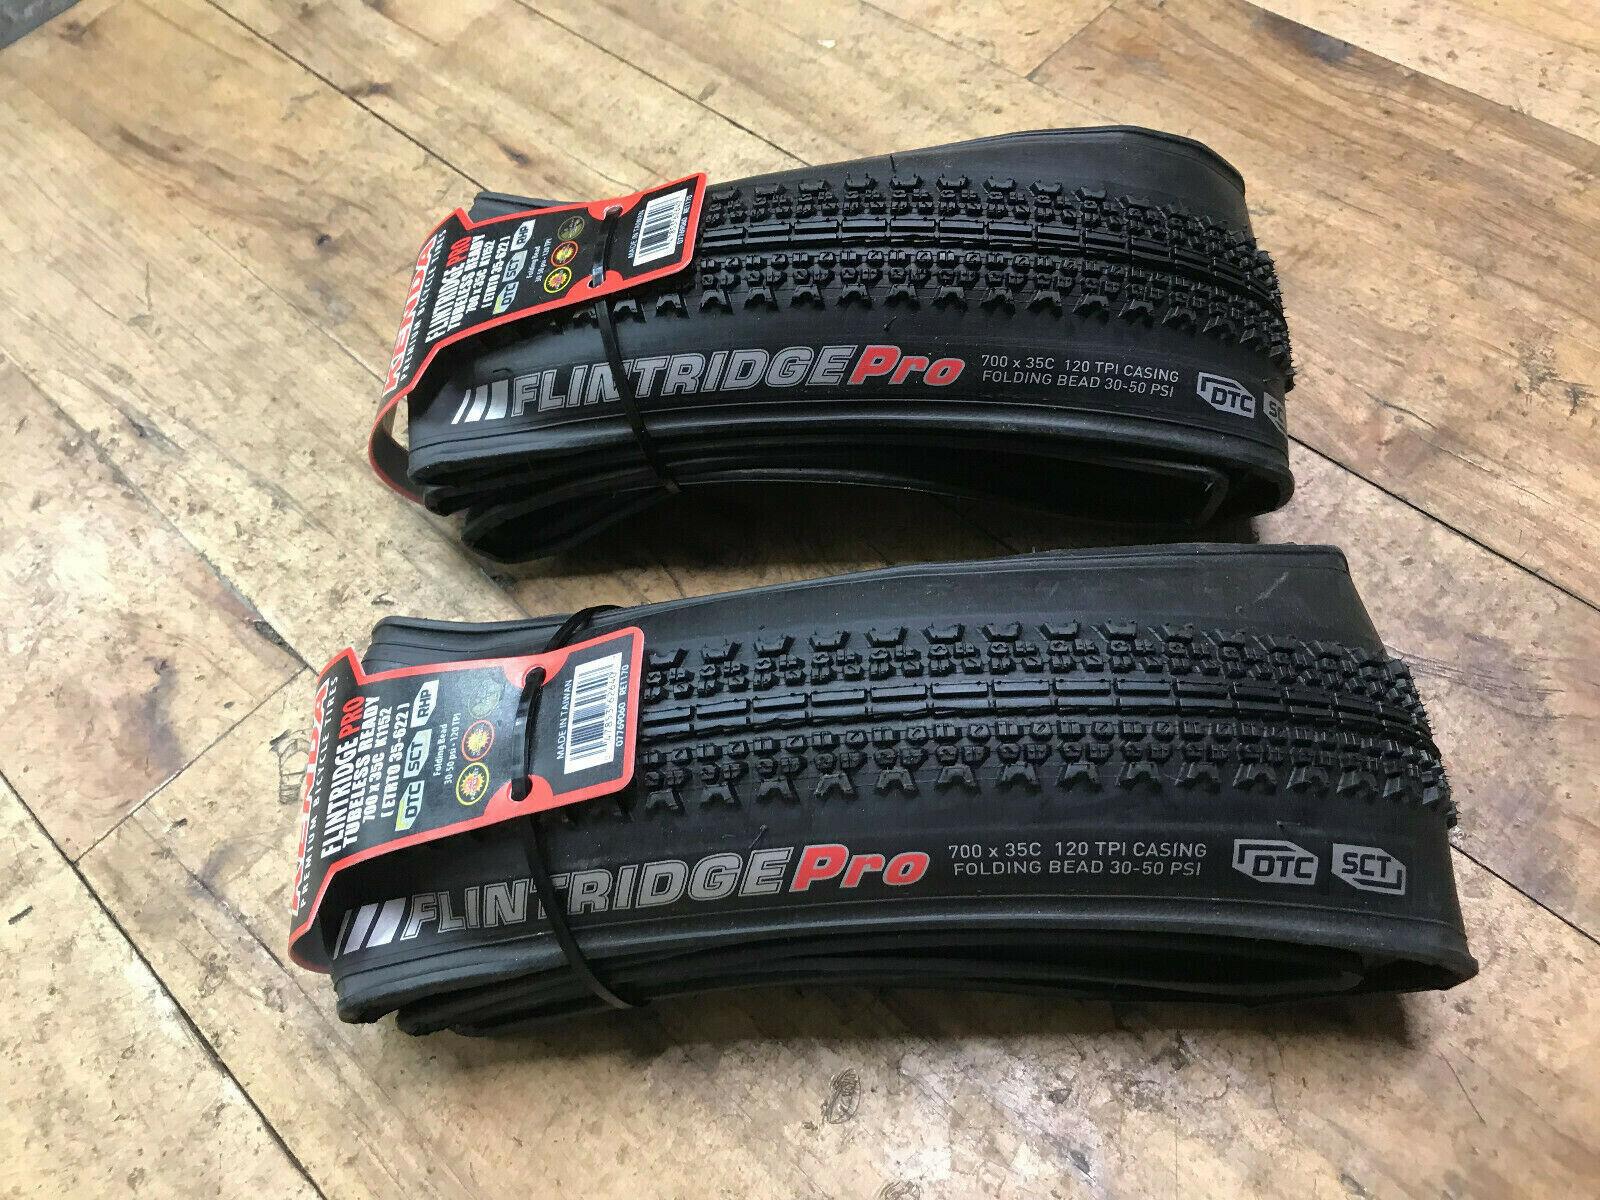 NEW  Pair Kenda Flintridge Pro 700 x 35mm - DTC - Tubeless Ready - 120 TPI -K1152  cheap in high quality